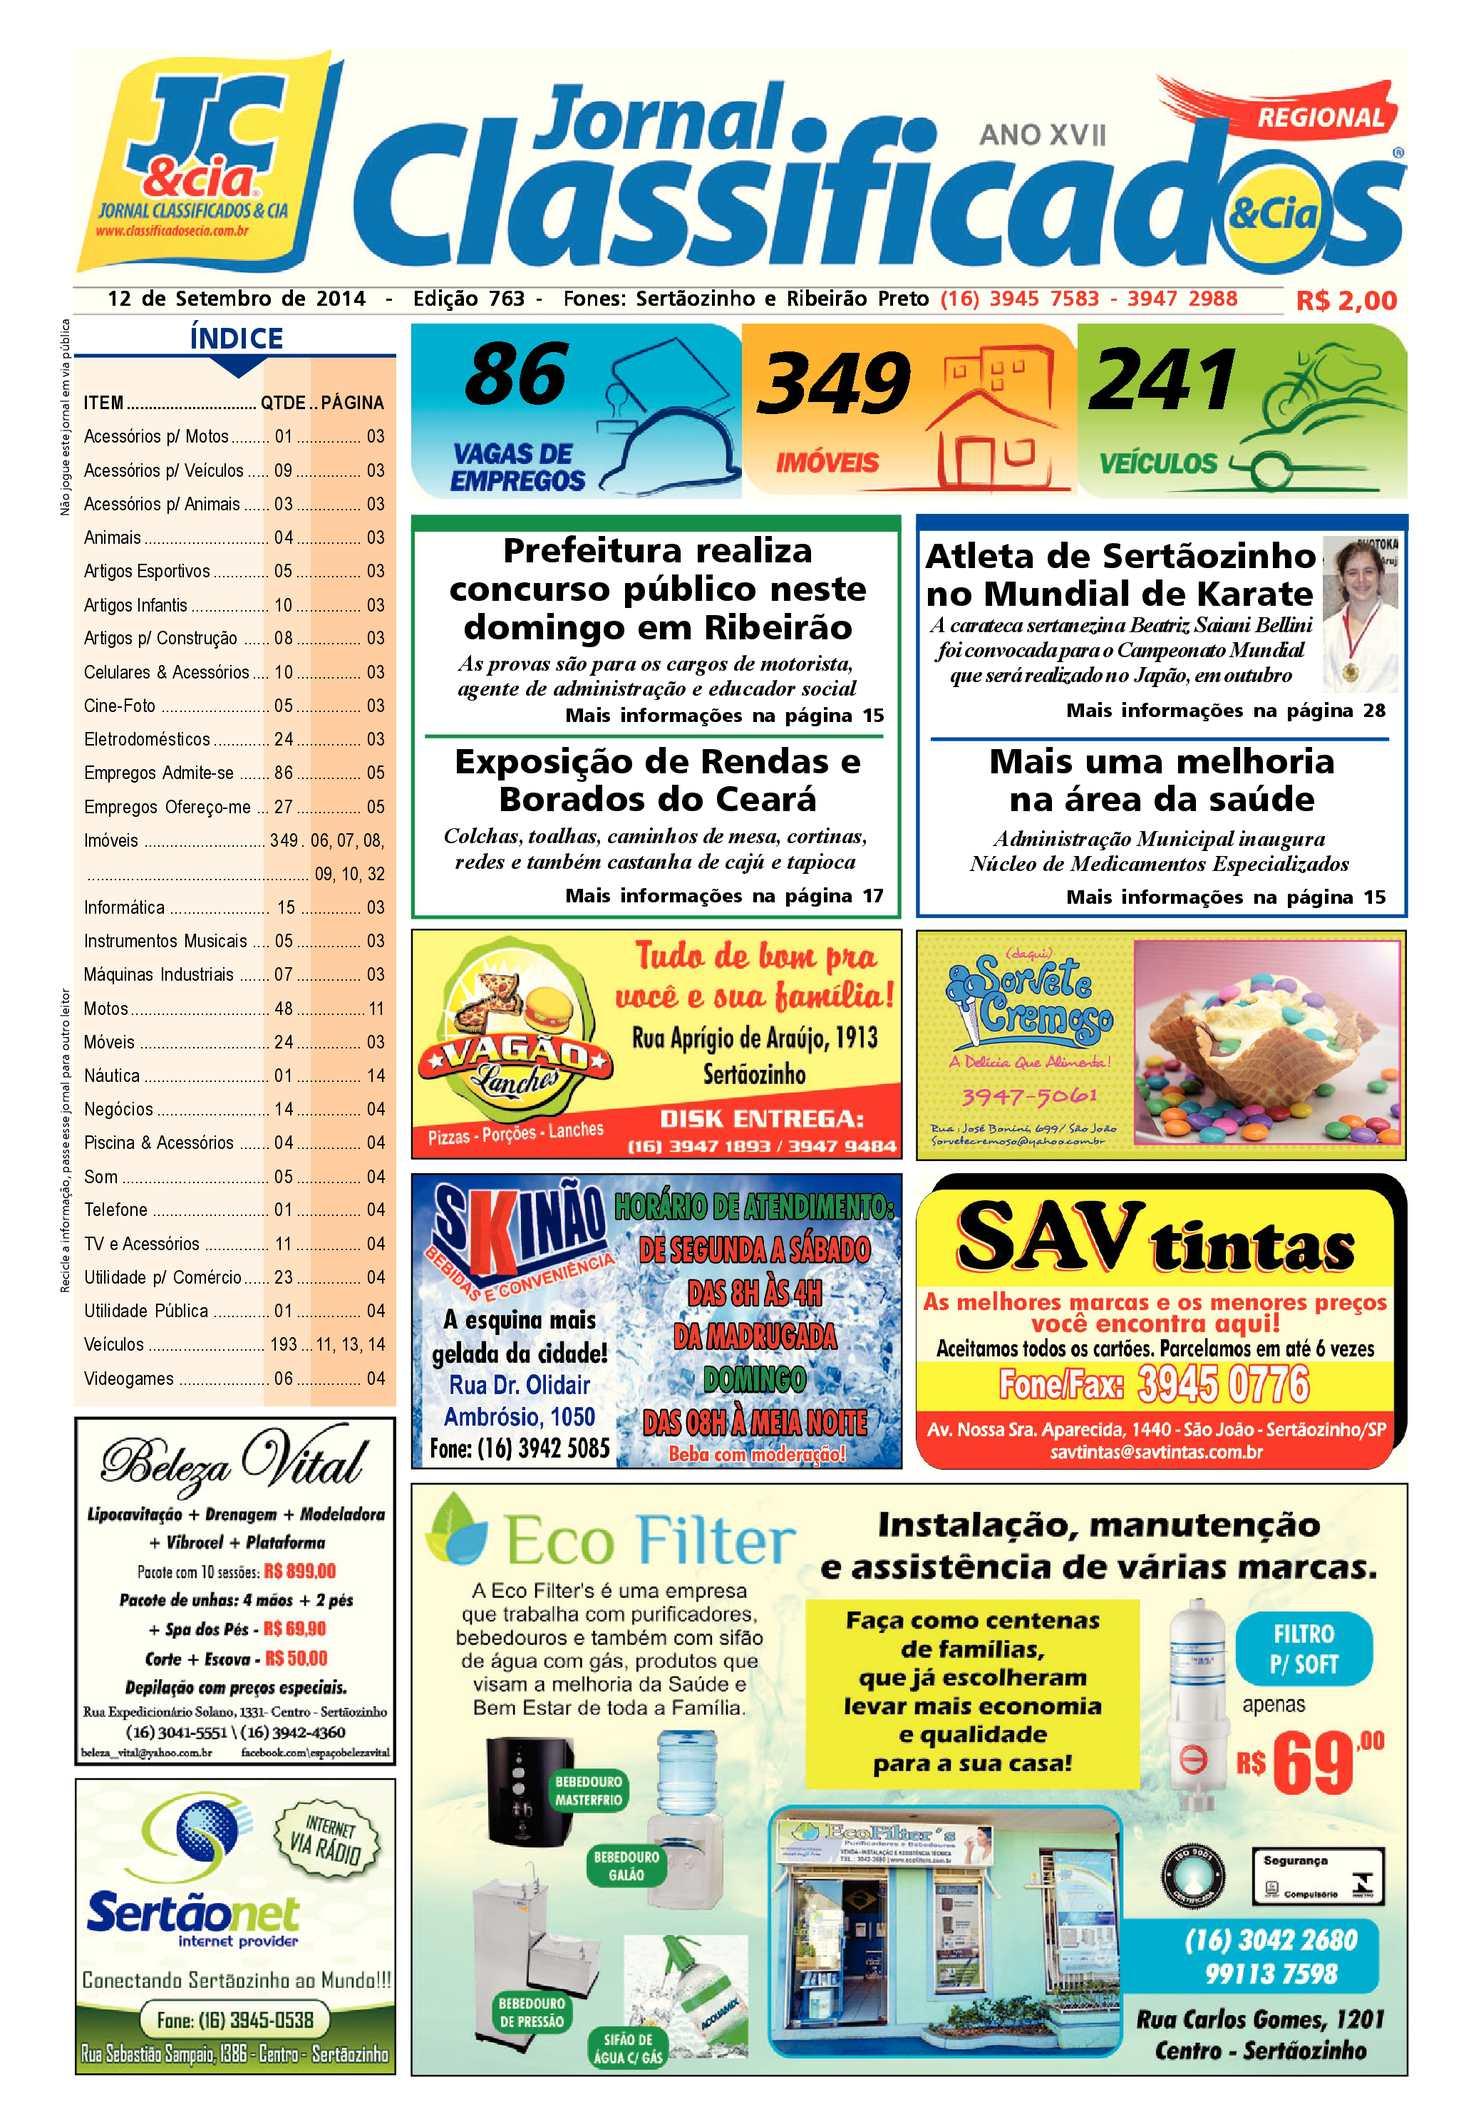 Calaméo - Regional 763 8ec5d45b1c8ed